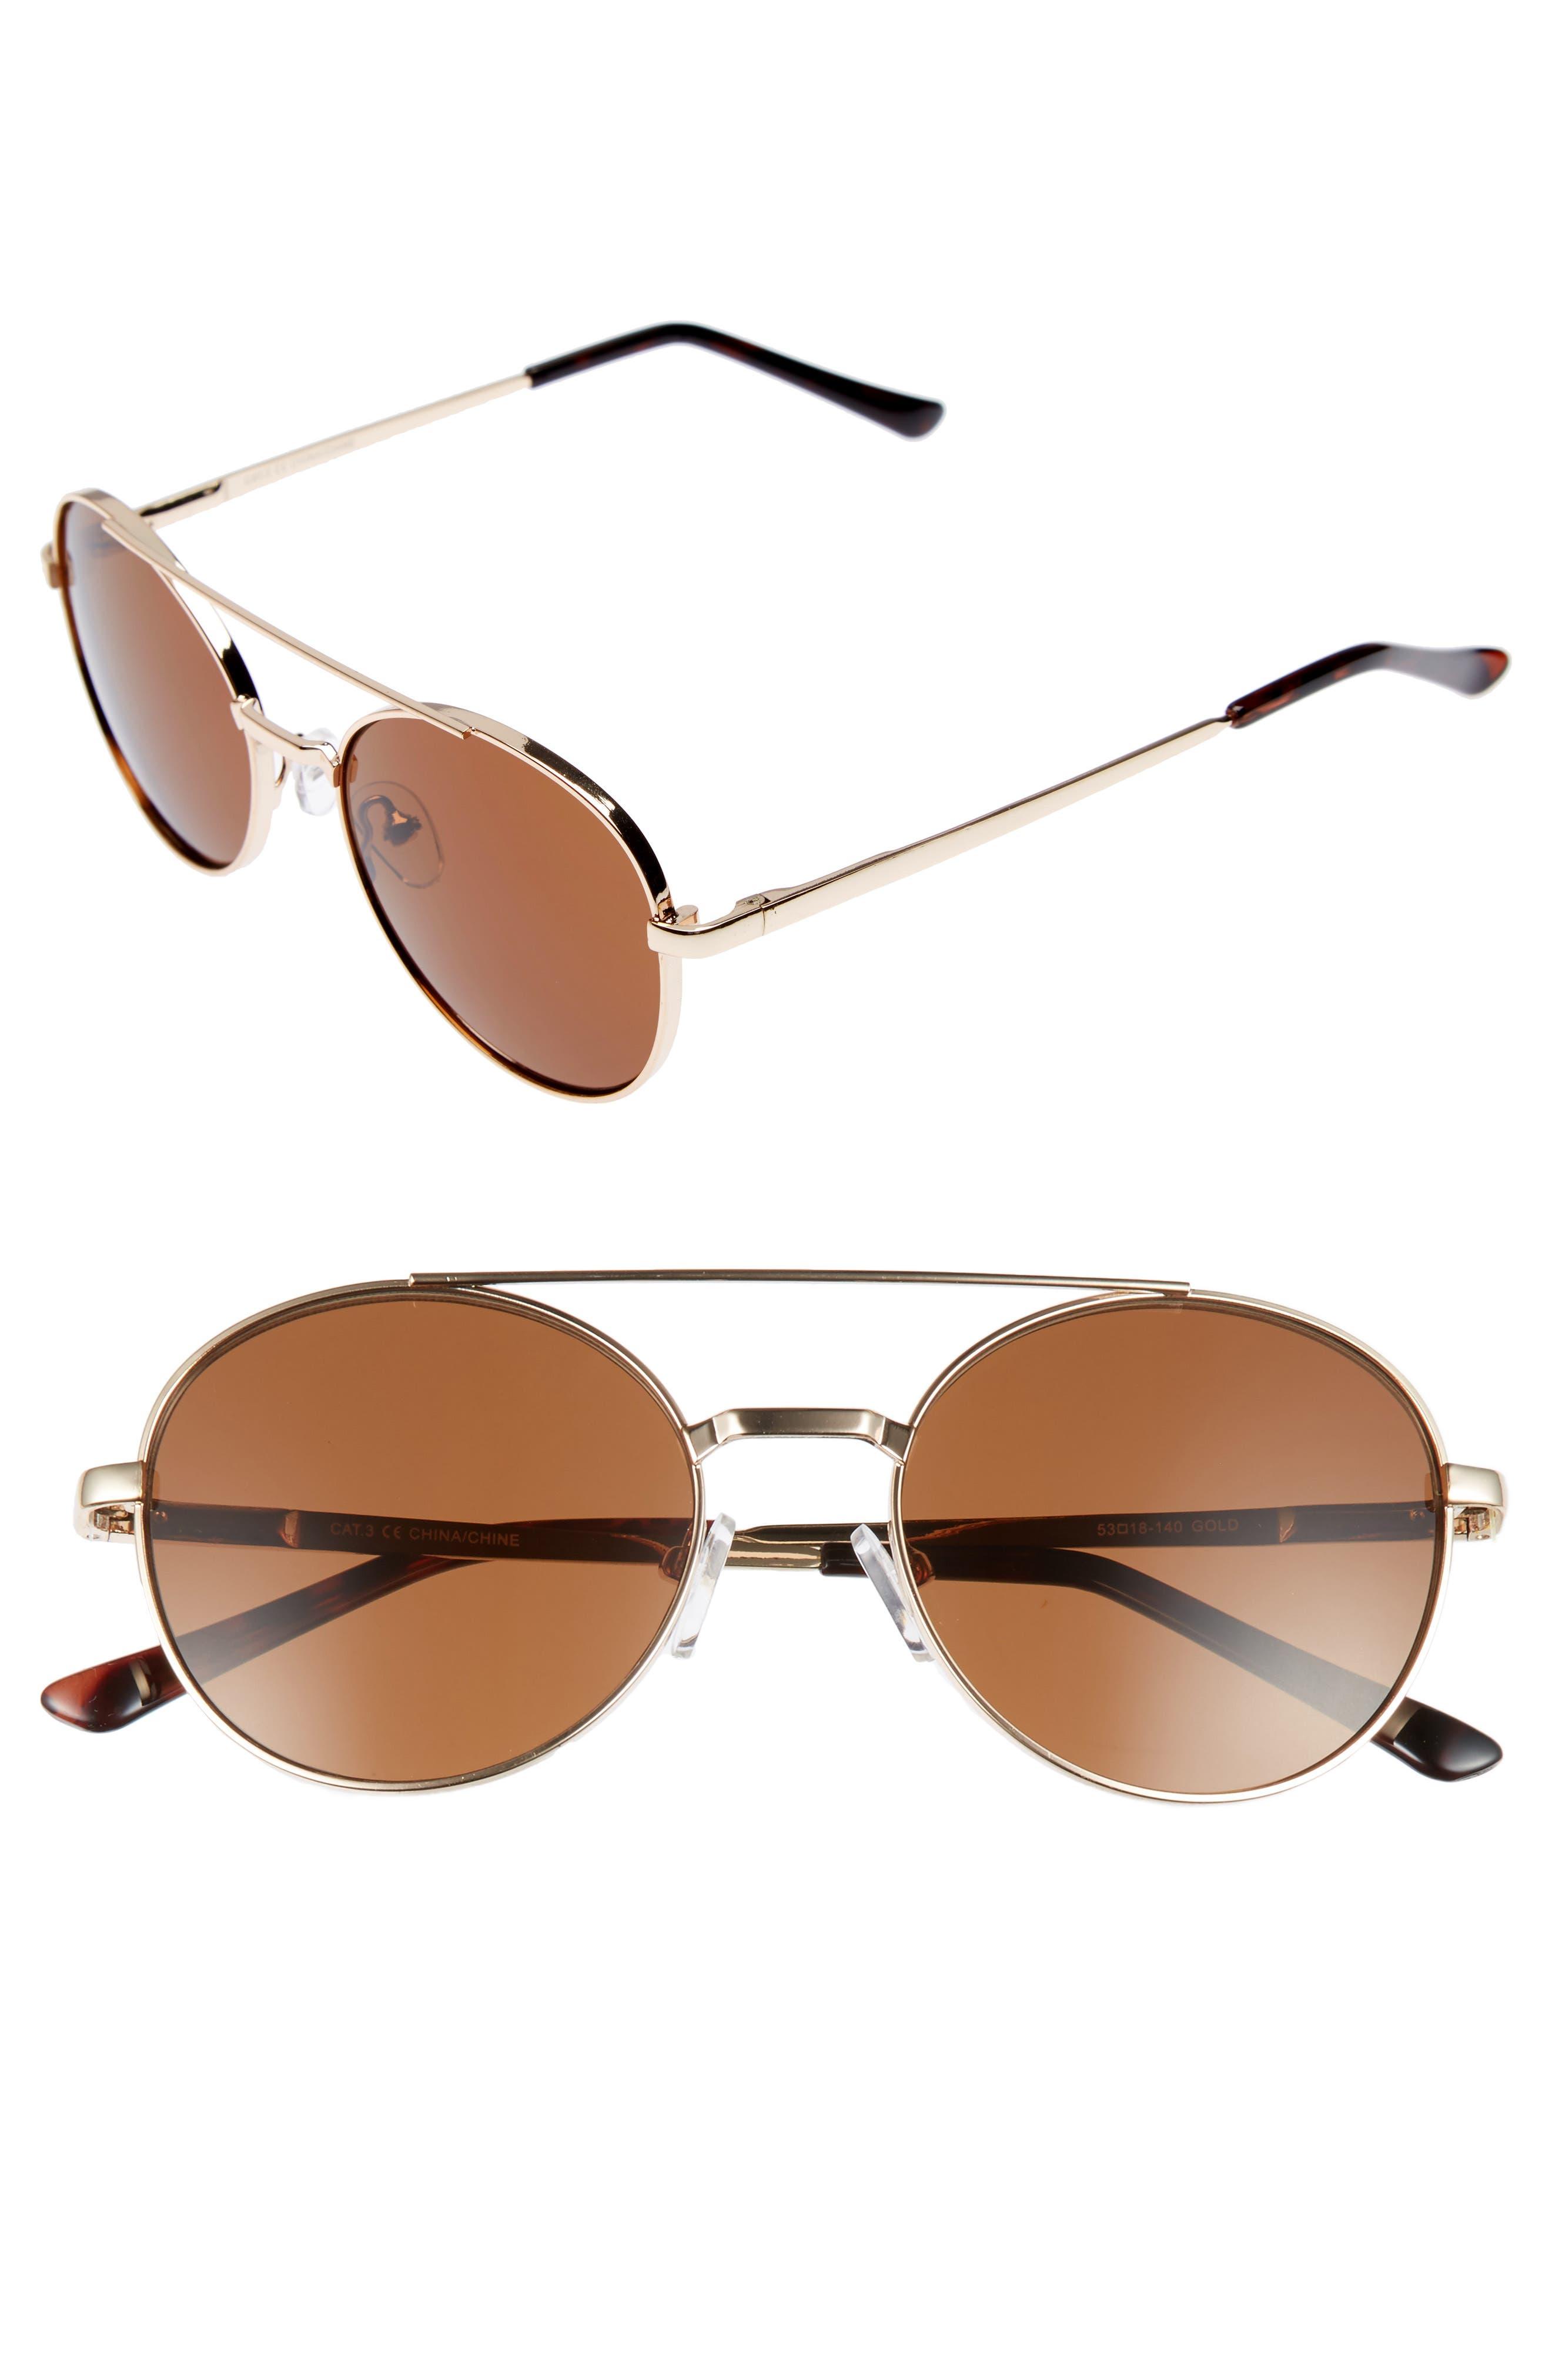 Logan 52mm Sunglasses,                             Main thumbnail 1, color,                             Gold/ Brown